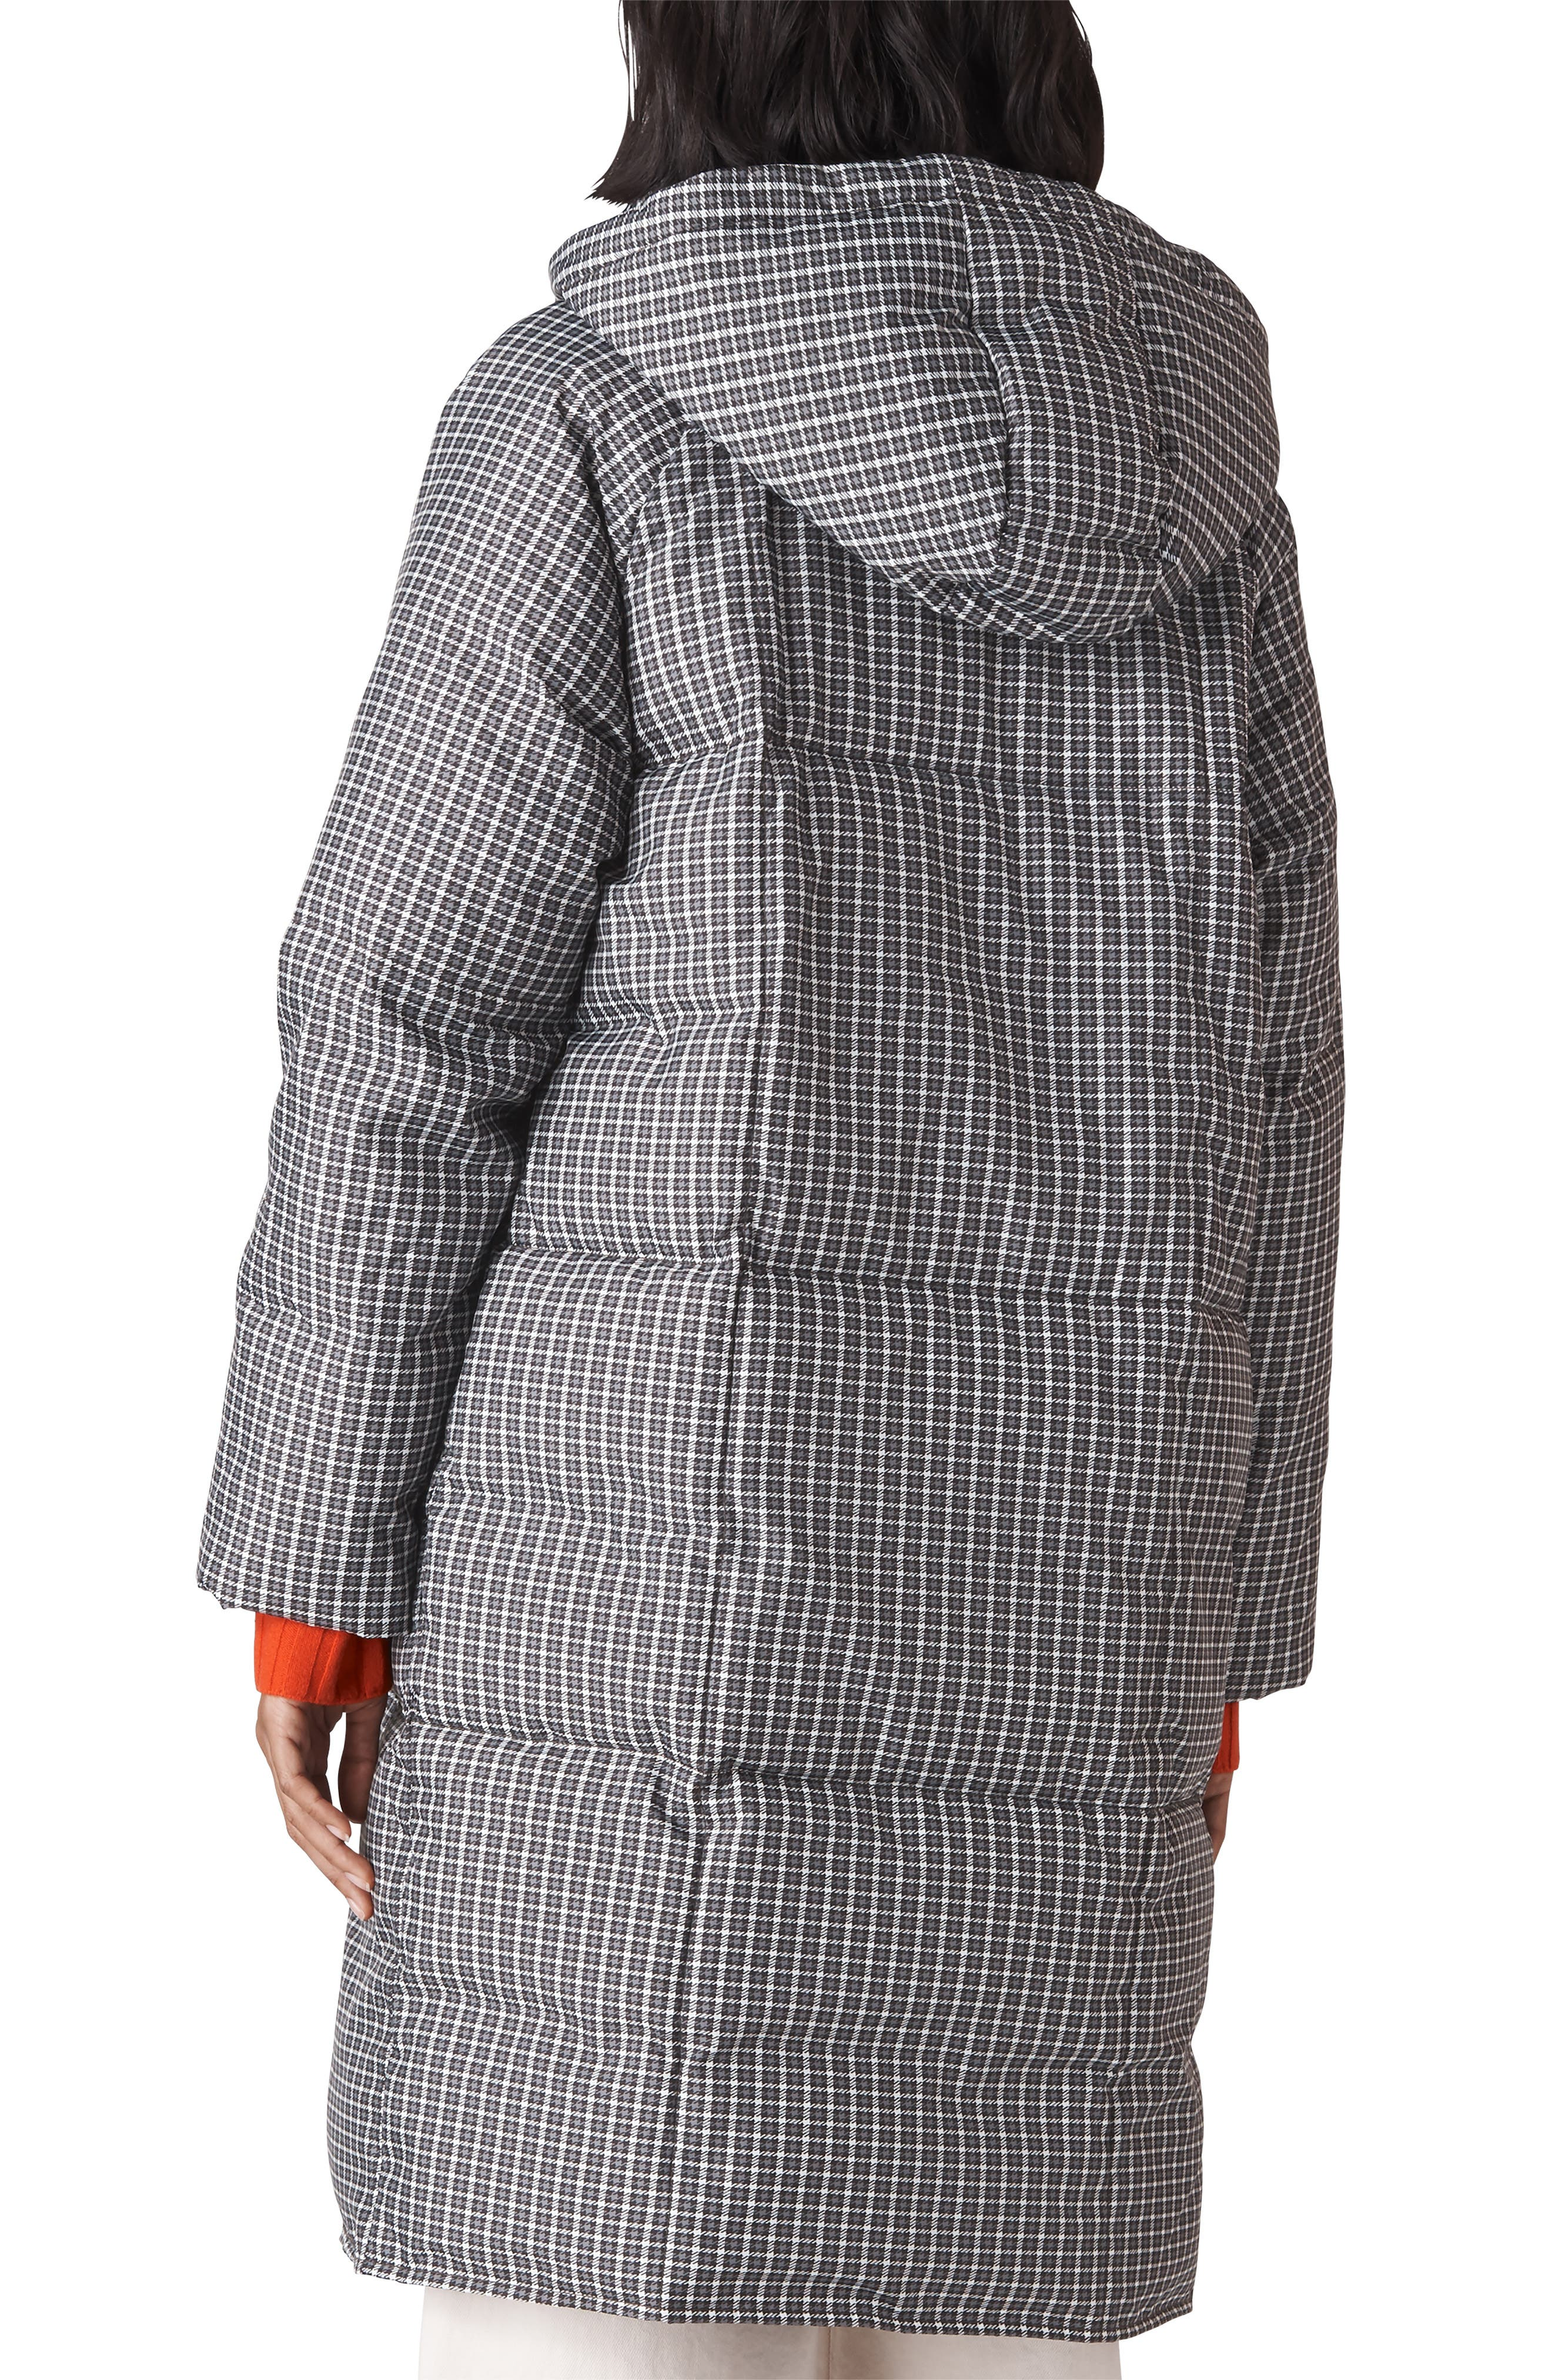 WHISTLES,                             Check Longline Puffer Coat,                             Alternate thumbnail 2, color,                             001